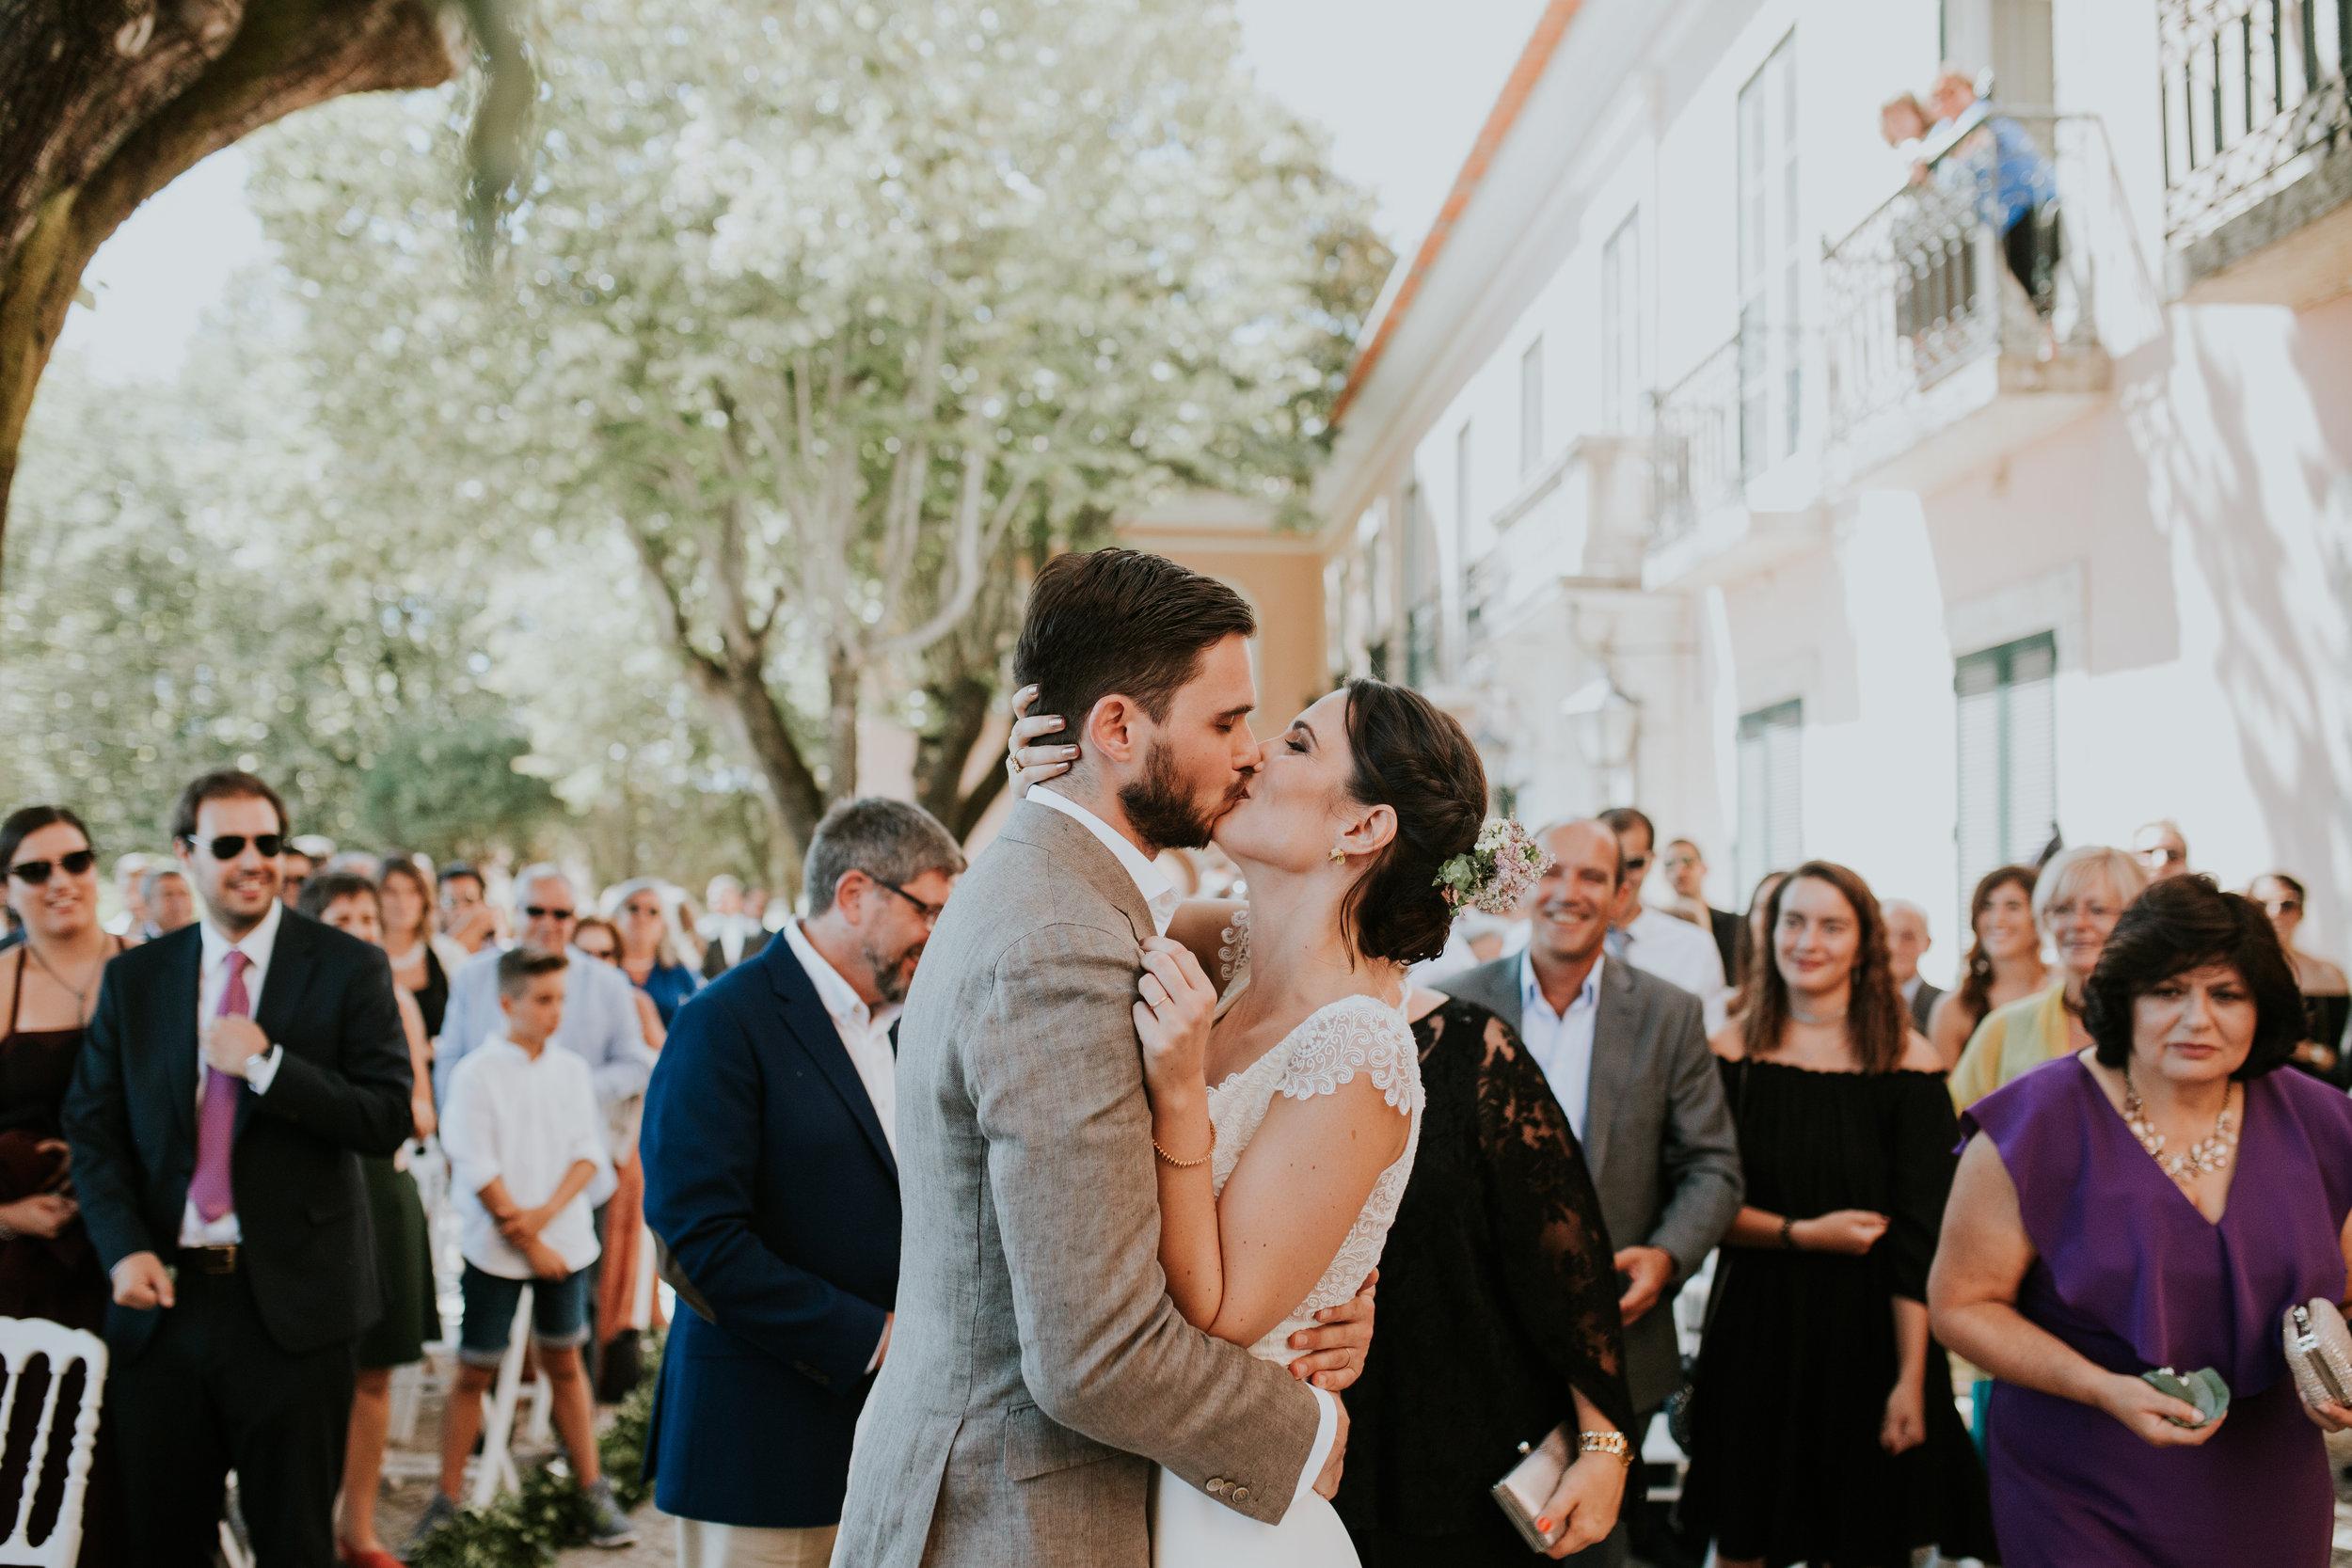 J&P 297_ 02 setembro 2017 Wedding day_.jpg